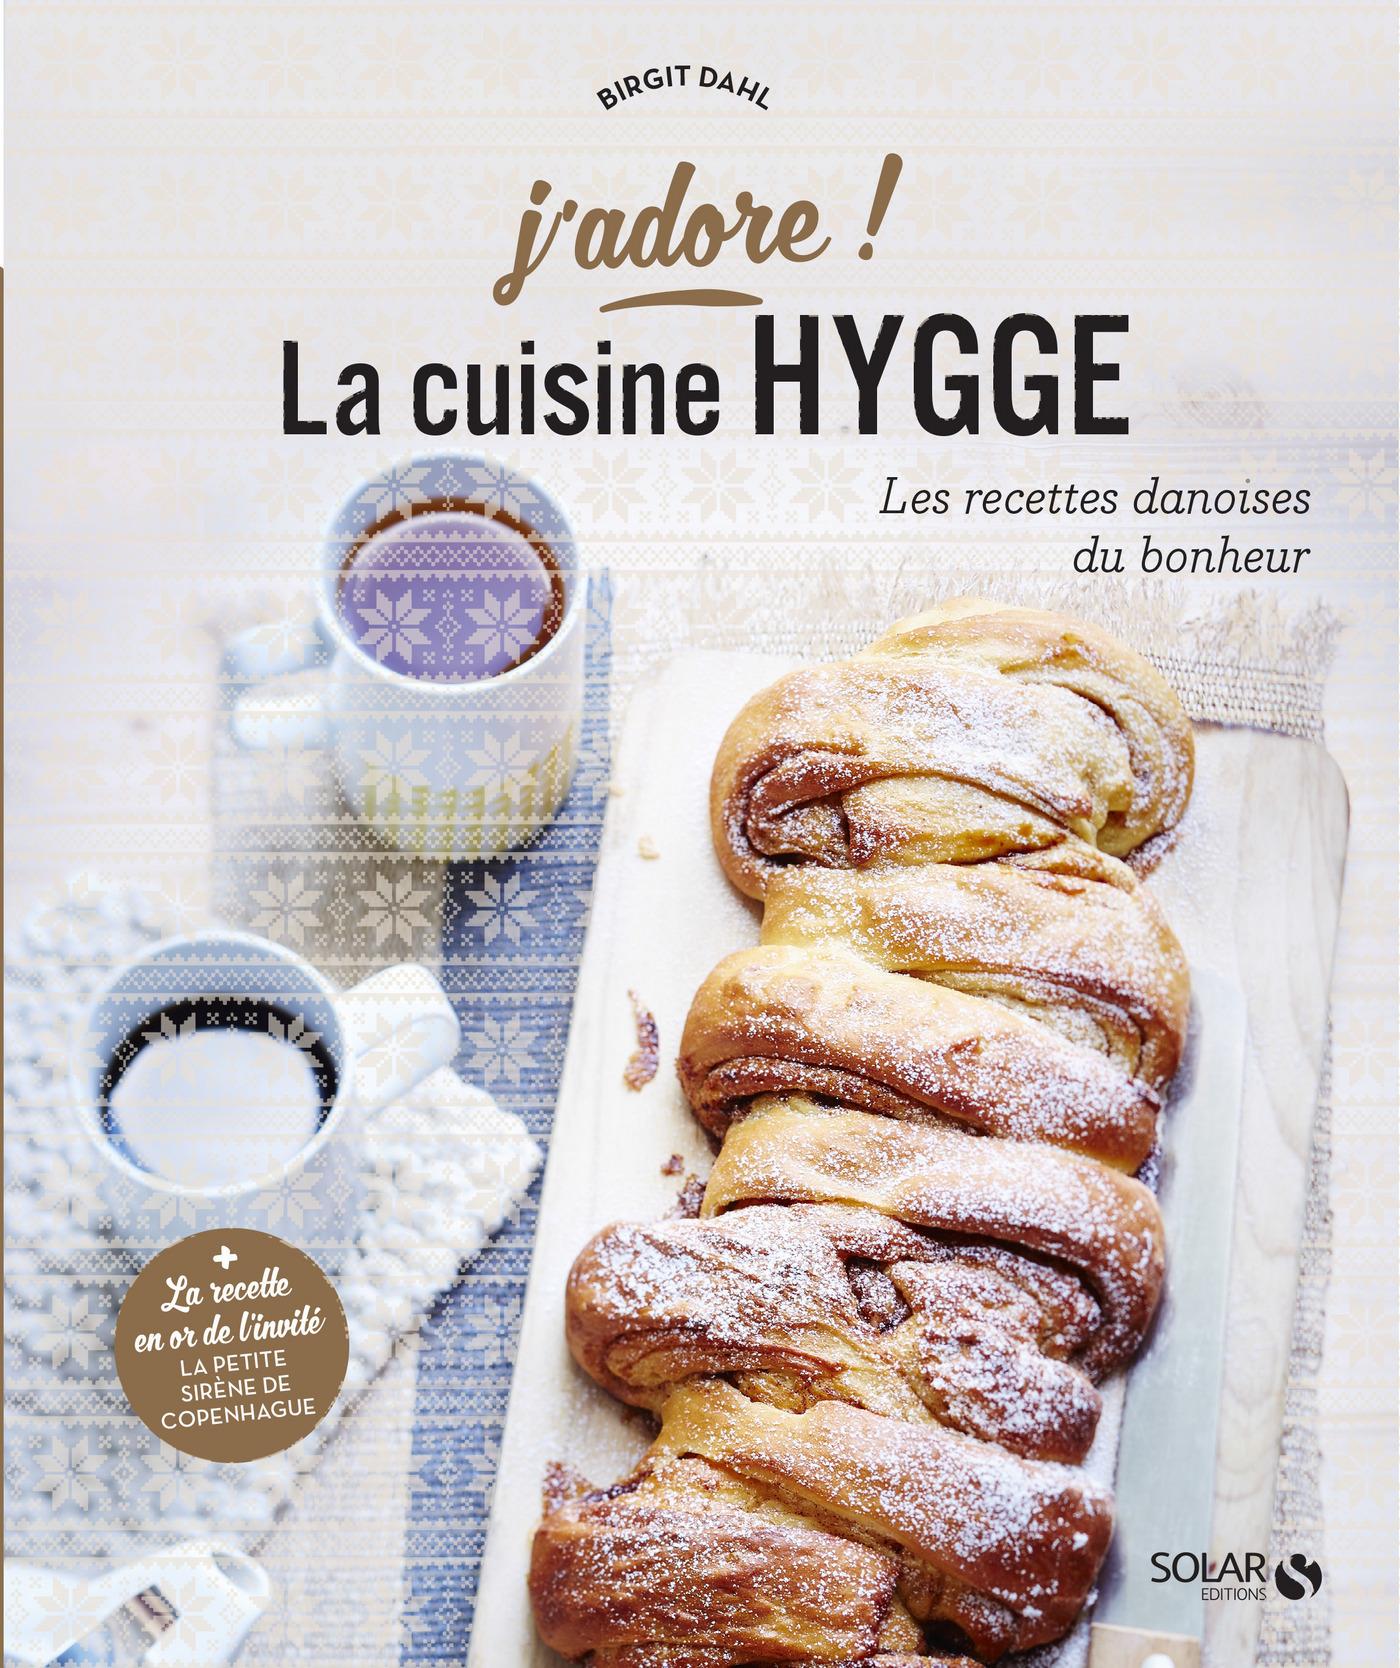 Cuisine hygge - j'adore | DAHL, Birgit